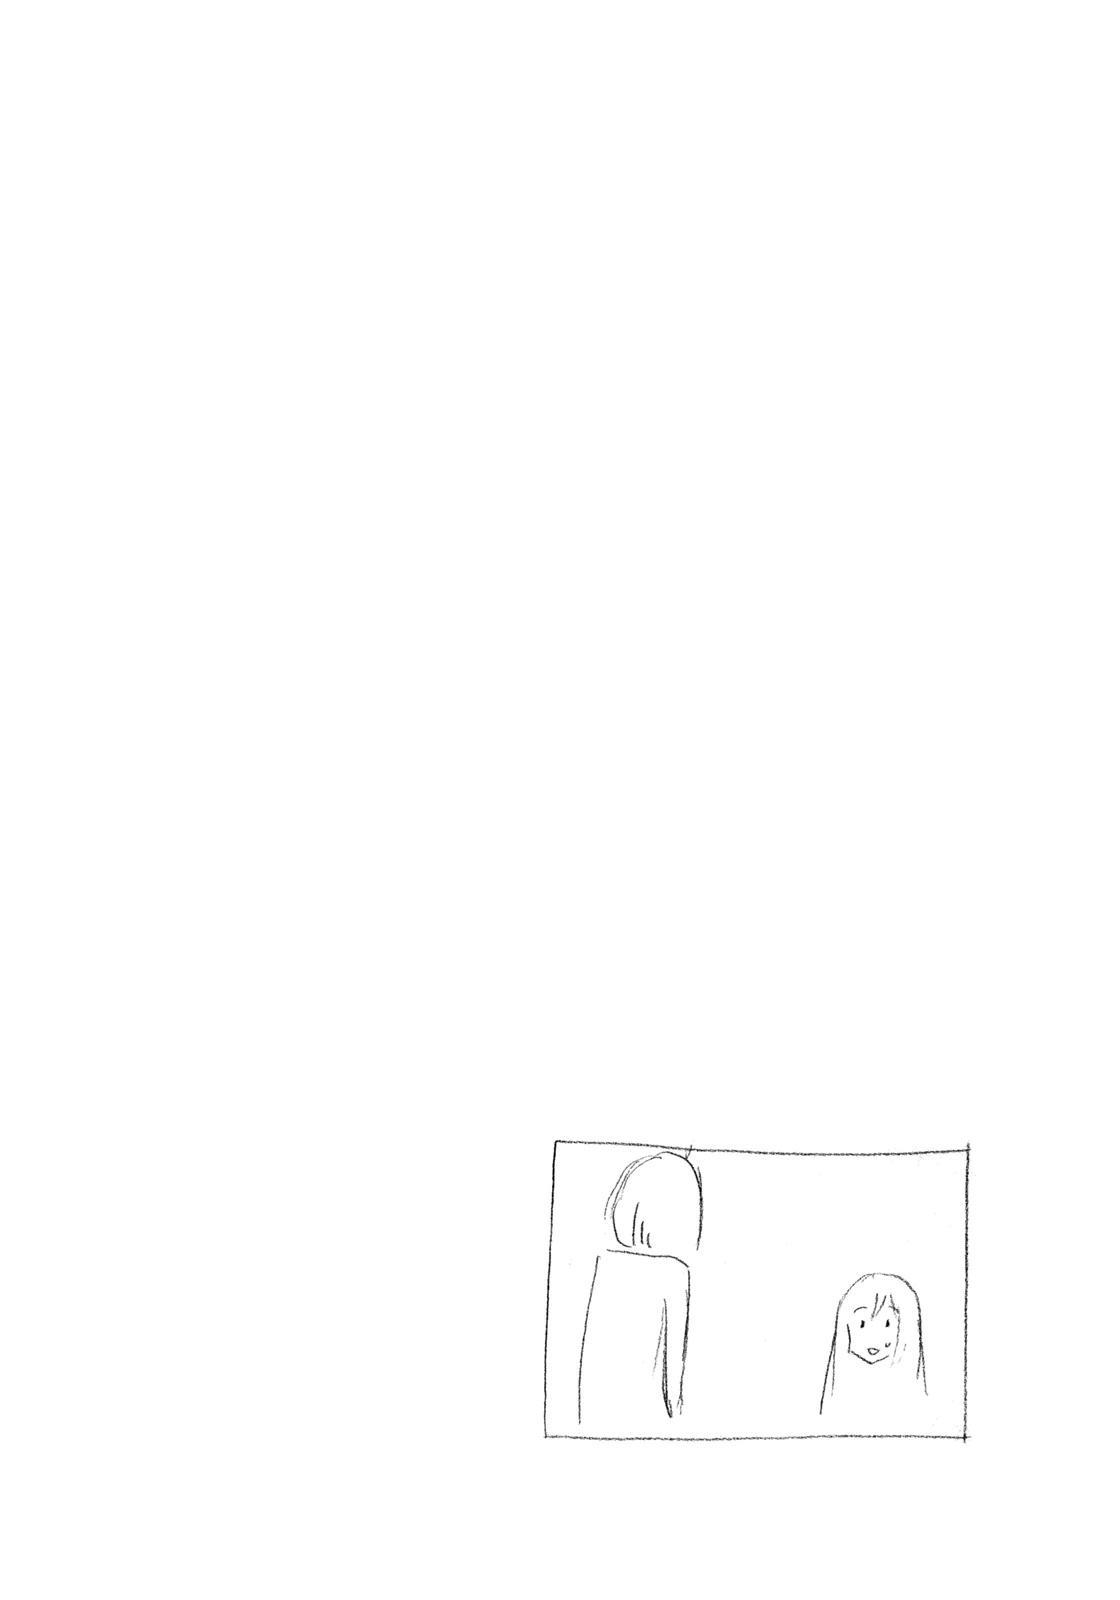 Minami-ke - Chapter 248